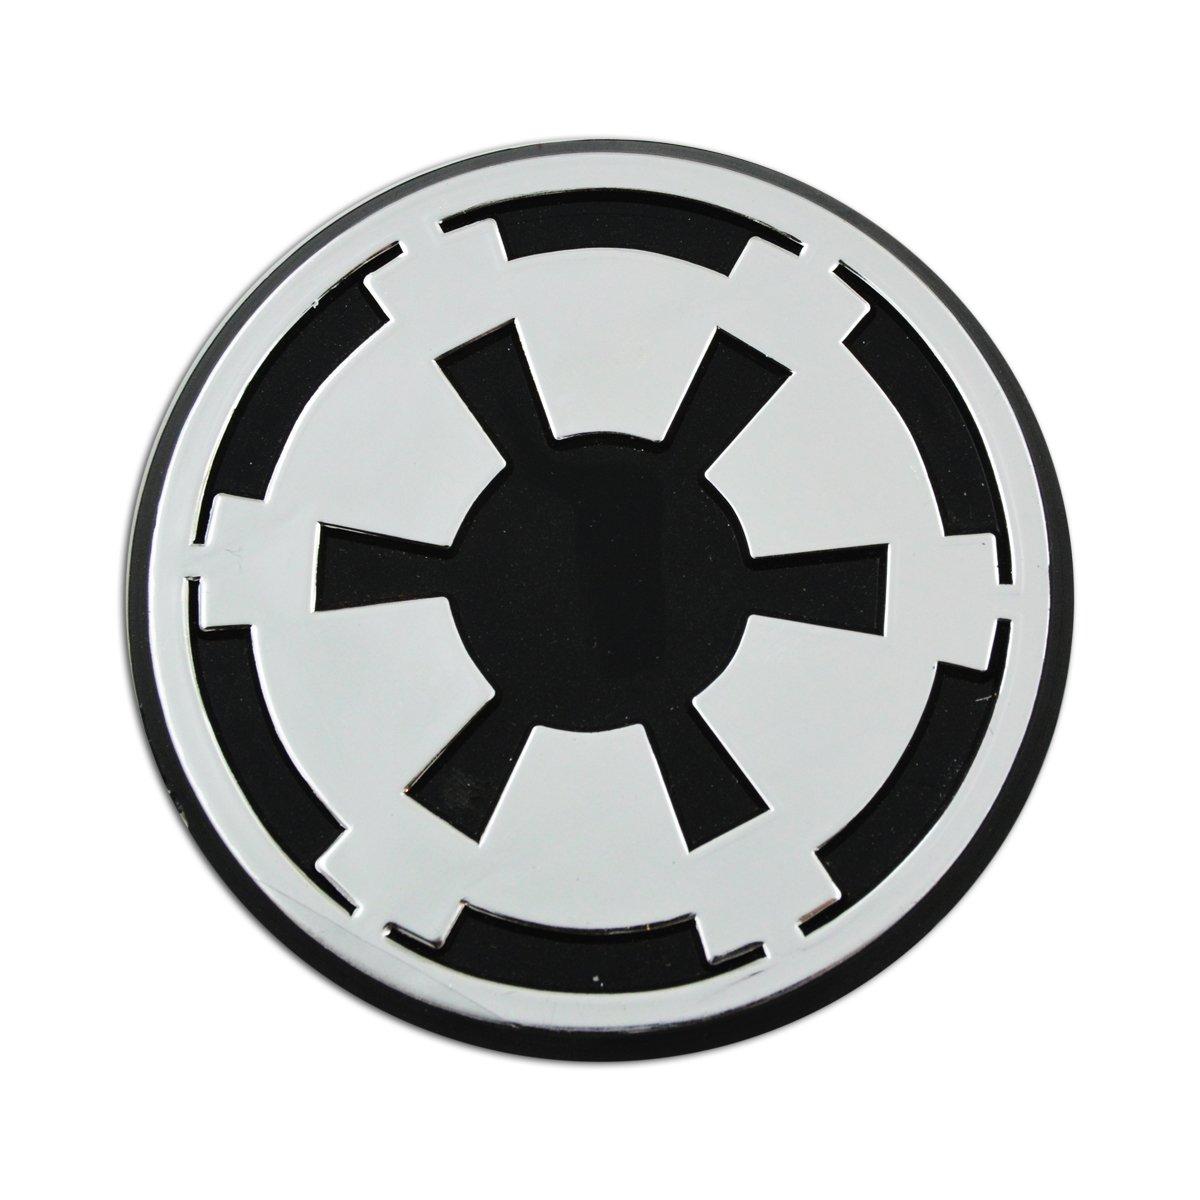 3 x 3 EvolveFISH EF-EMB-P-00075 Rebel Alliance Logo Chrome Auto Emblem